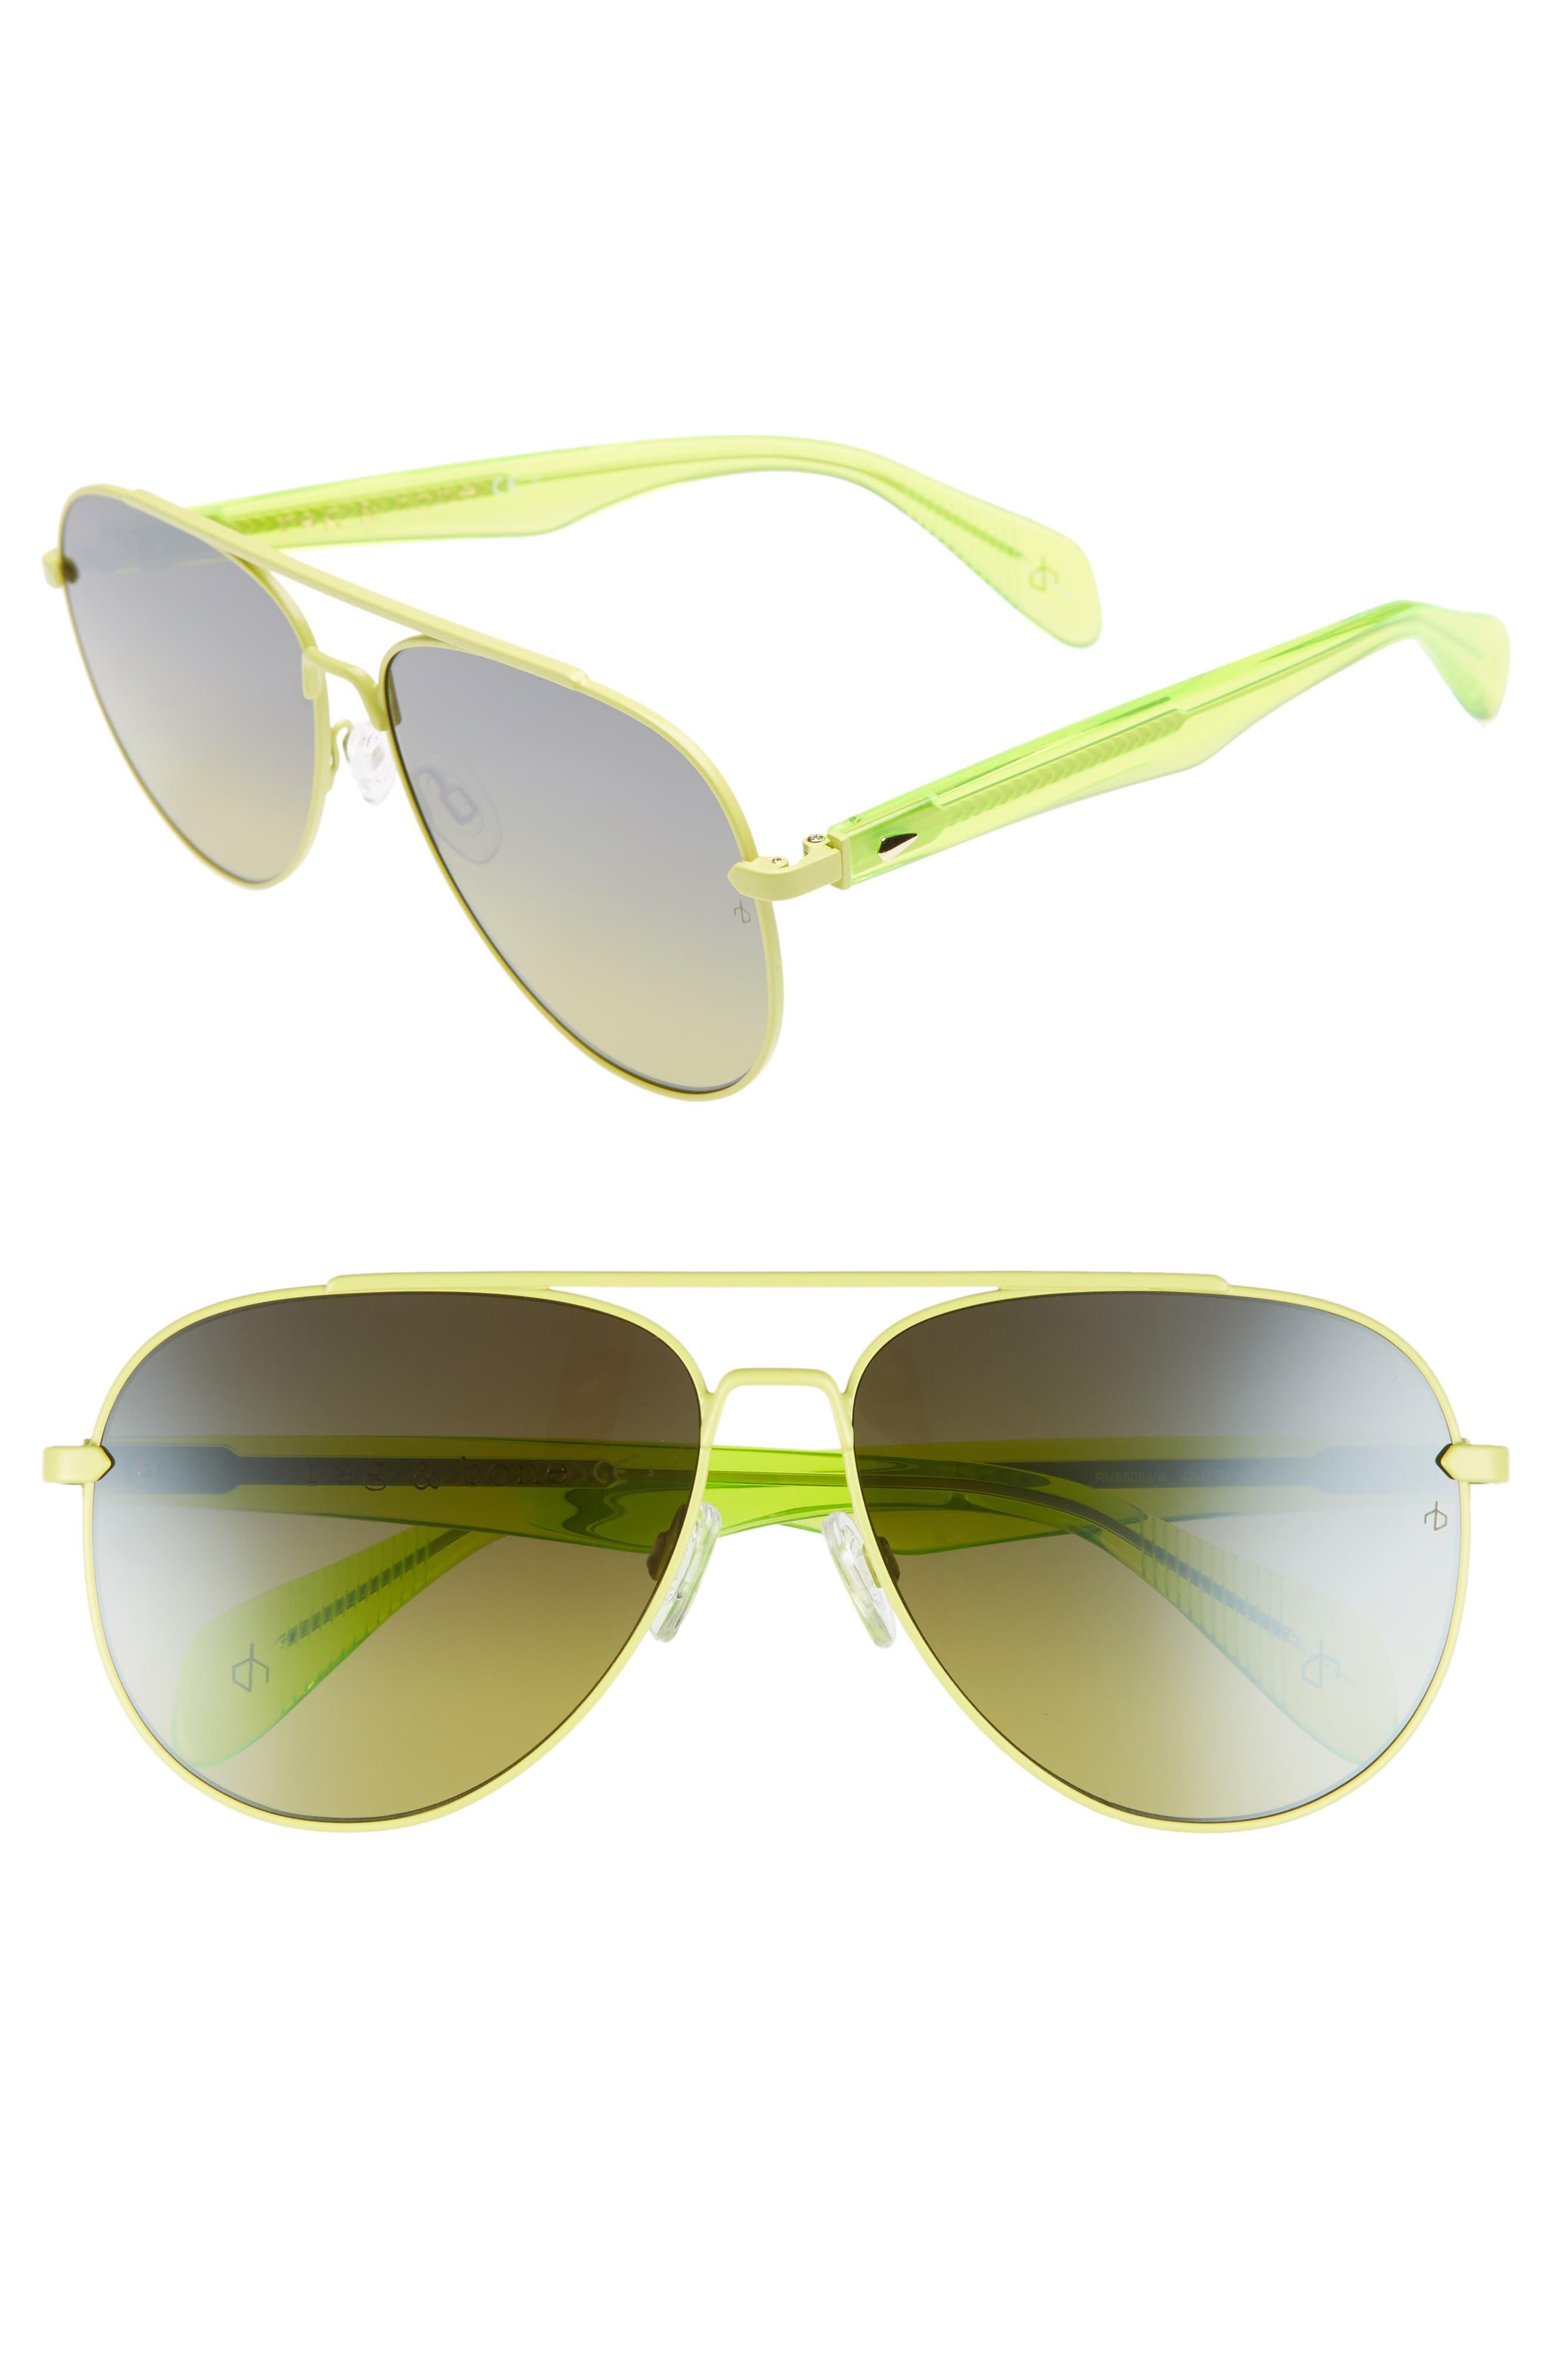 62mm Oversize Aviator Sunglasses,                             Main thumbnail 1, color,                             MATTE GREEN